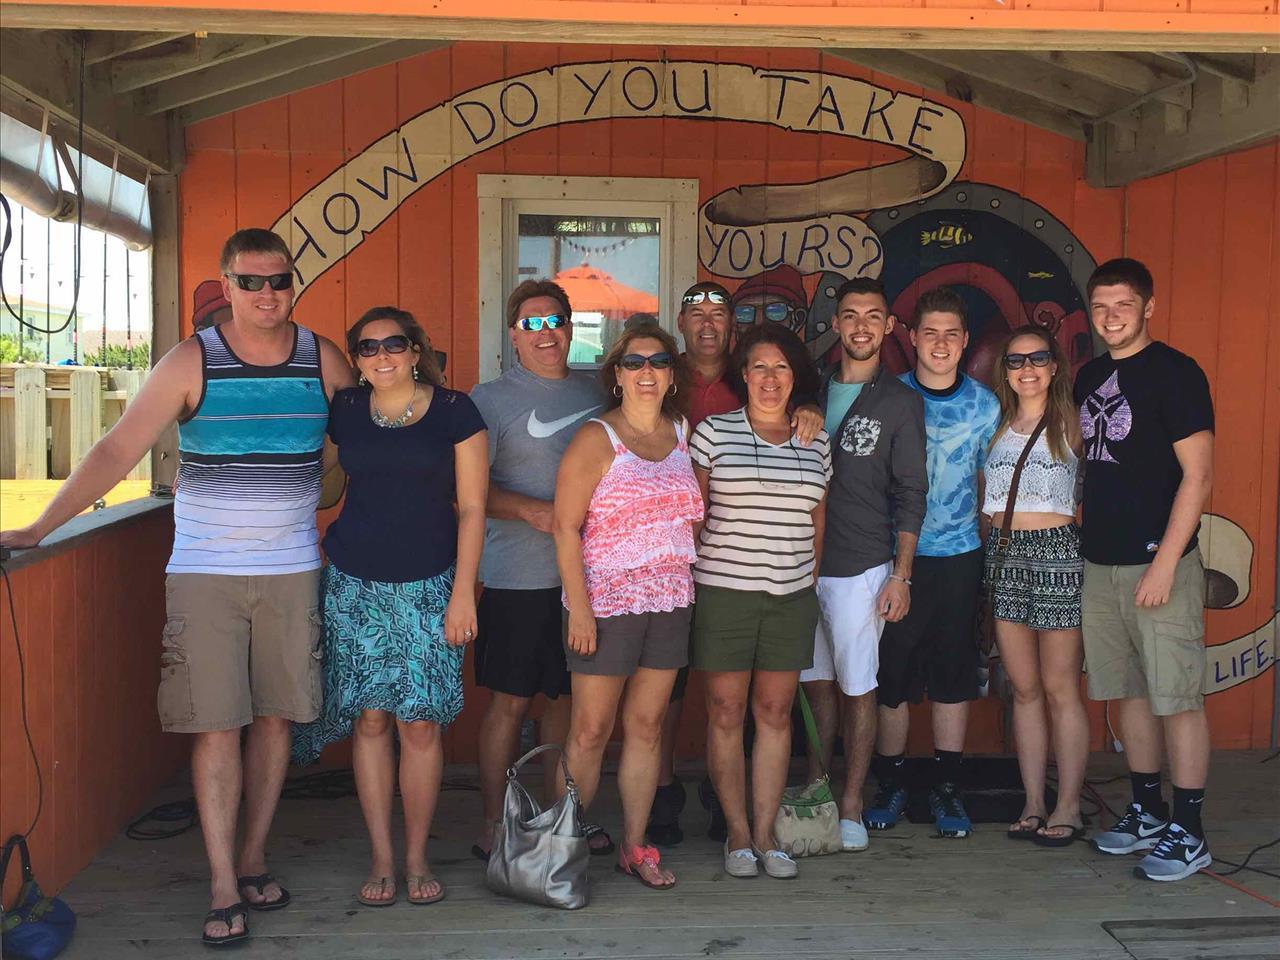 July 2015 Stay - SN37 - 4 Shore, Dale Feldhaus